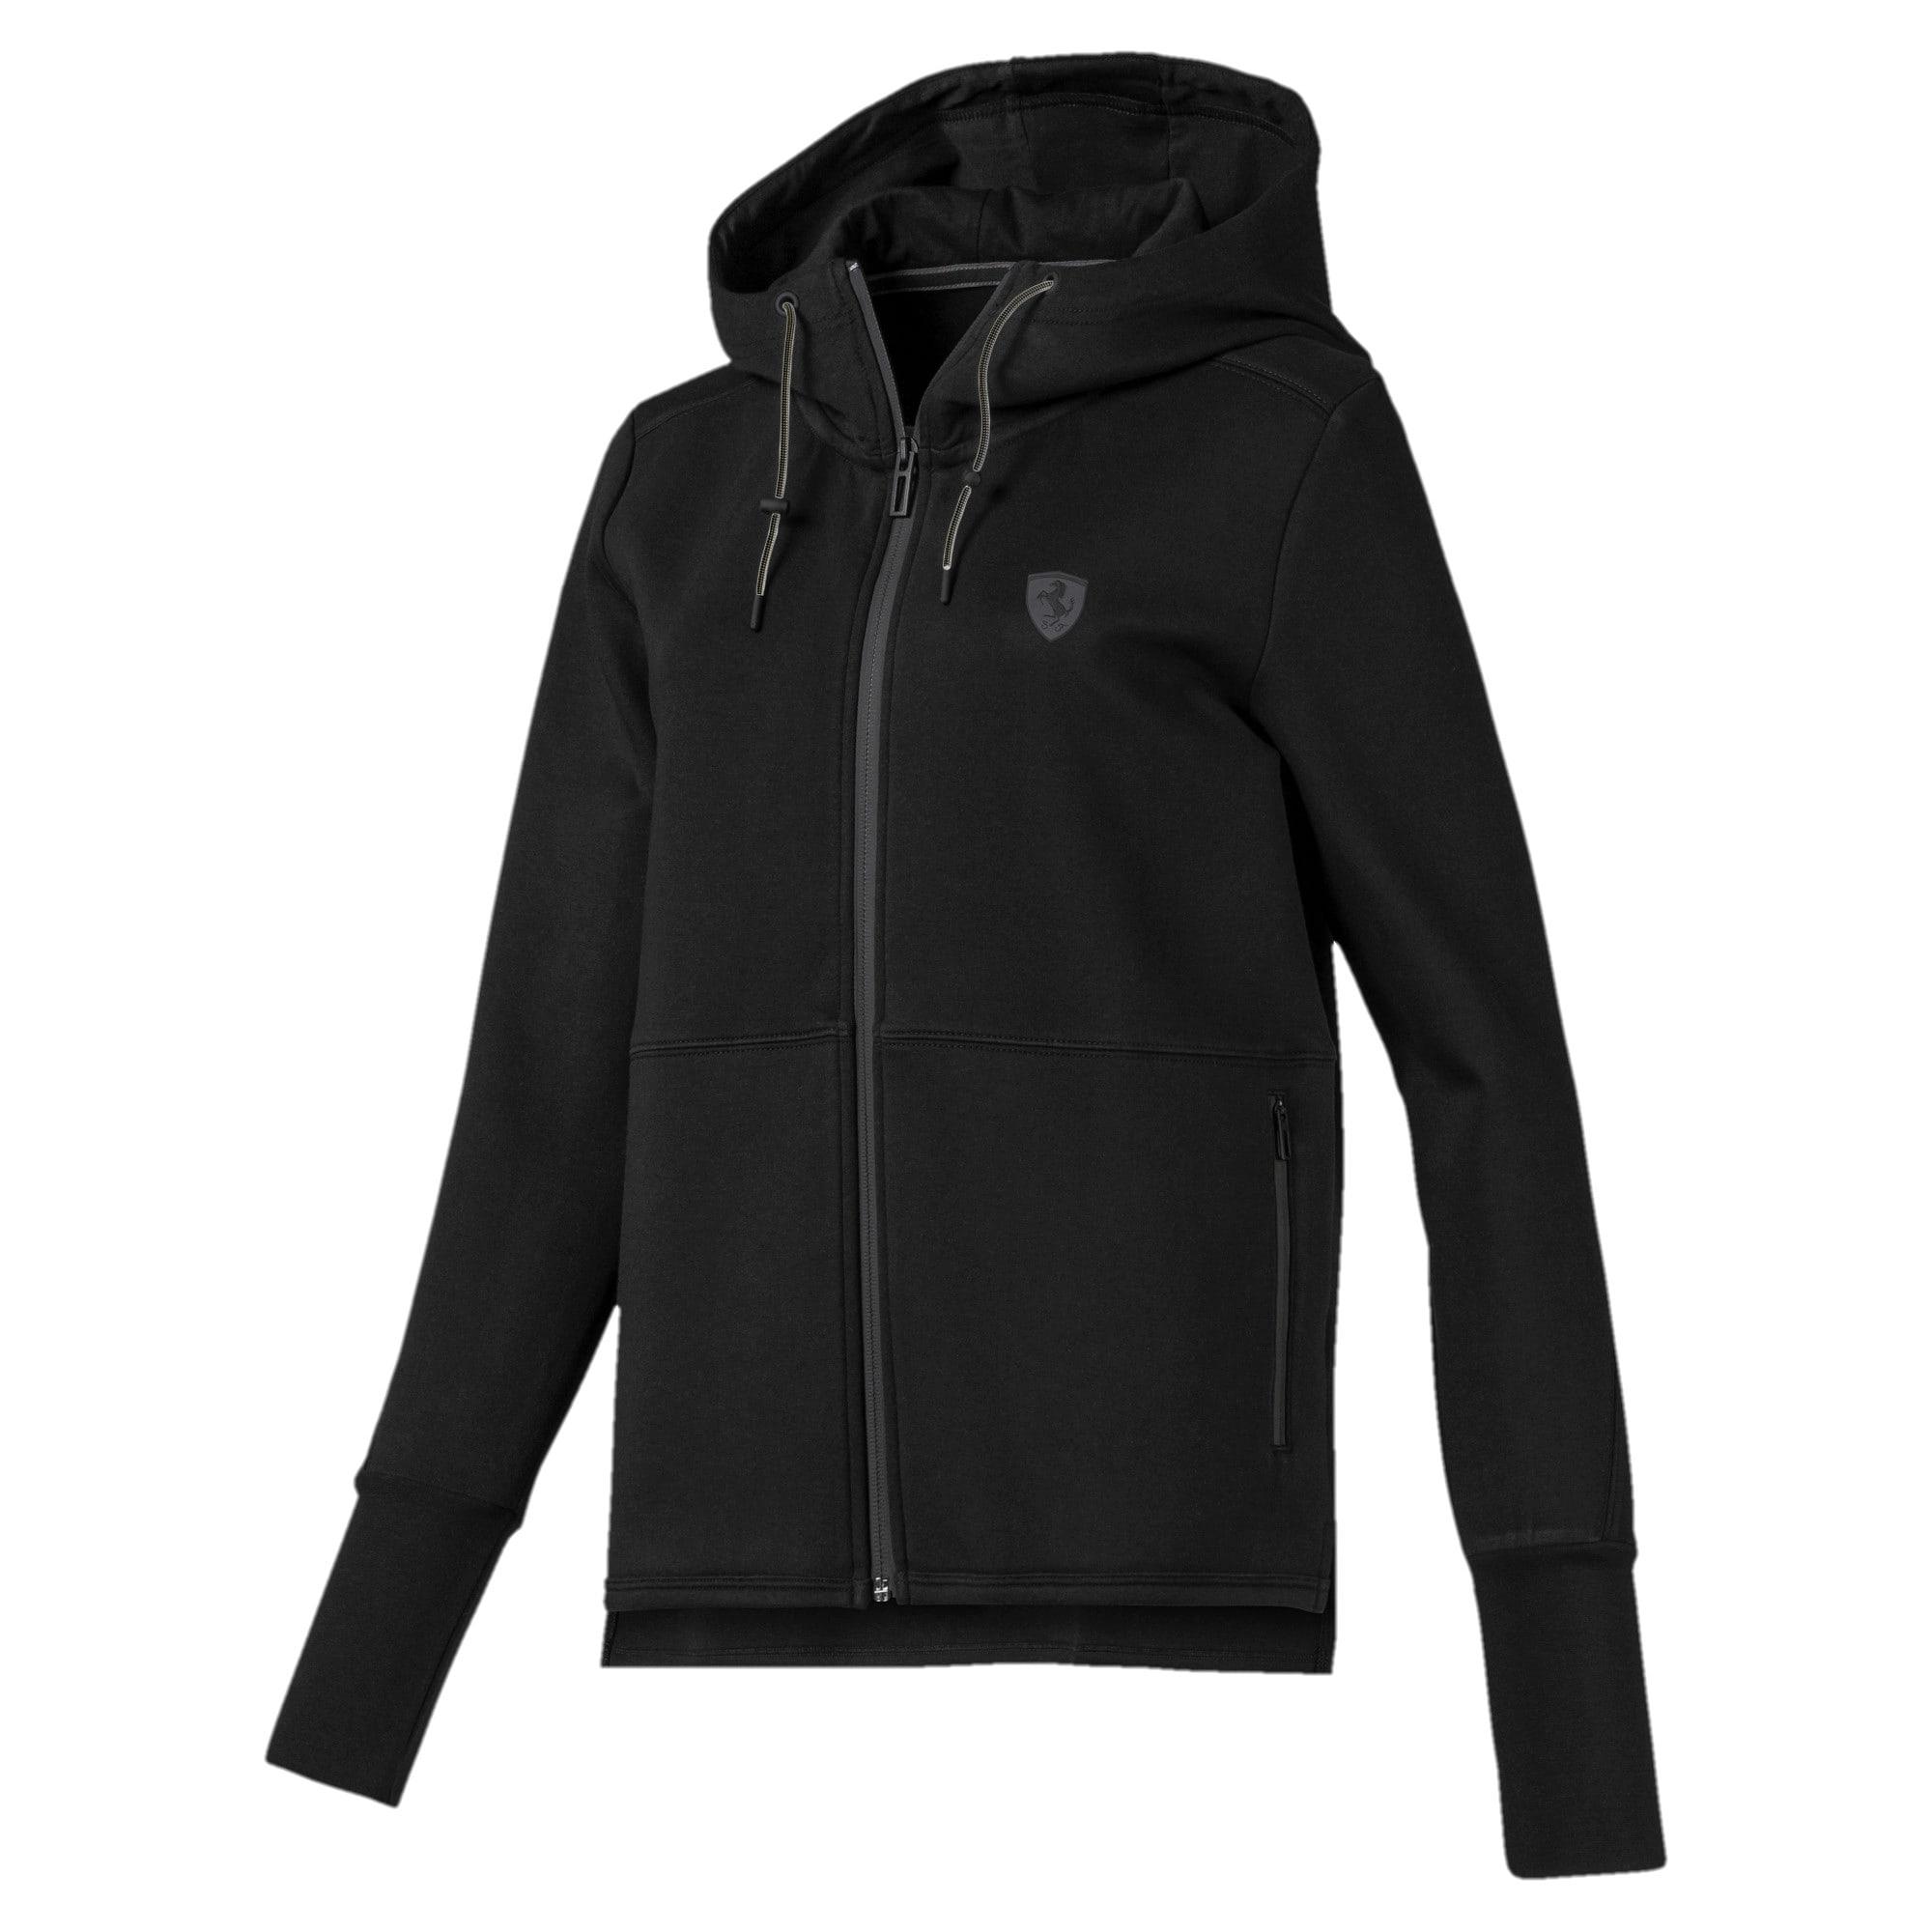 Thumbnail 1 of Scuderia Ferrari Women's Hooded Sweat Jacket, Puma Black, medium